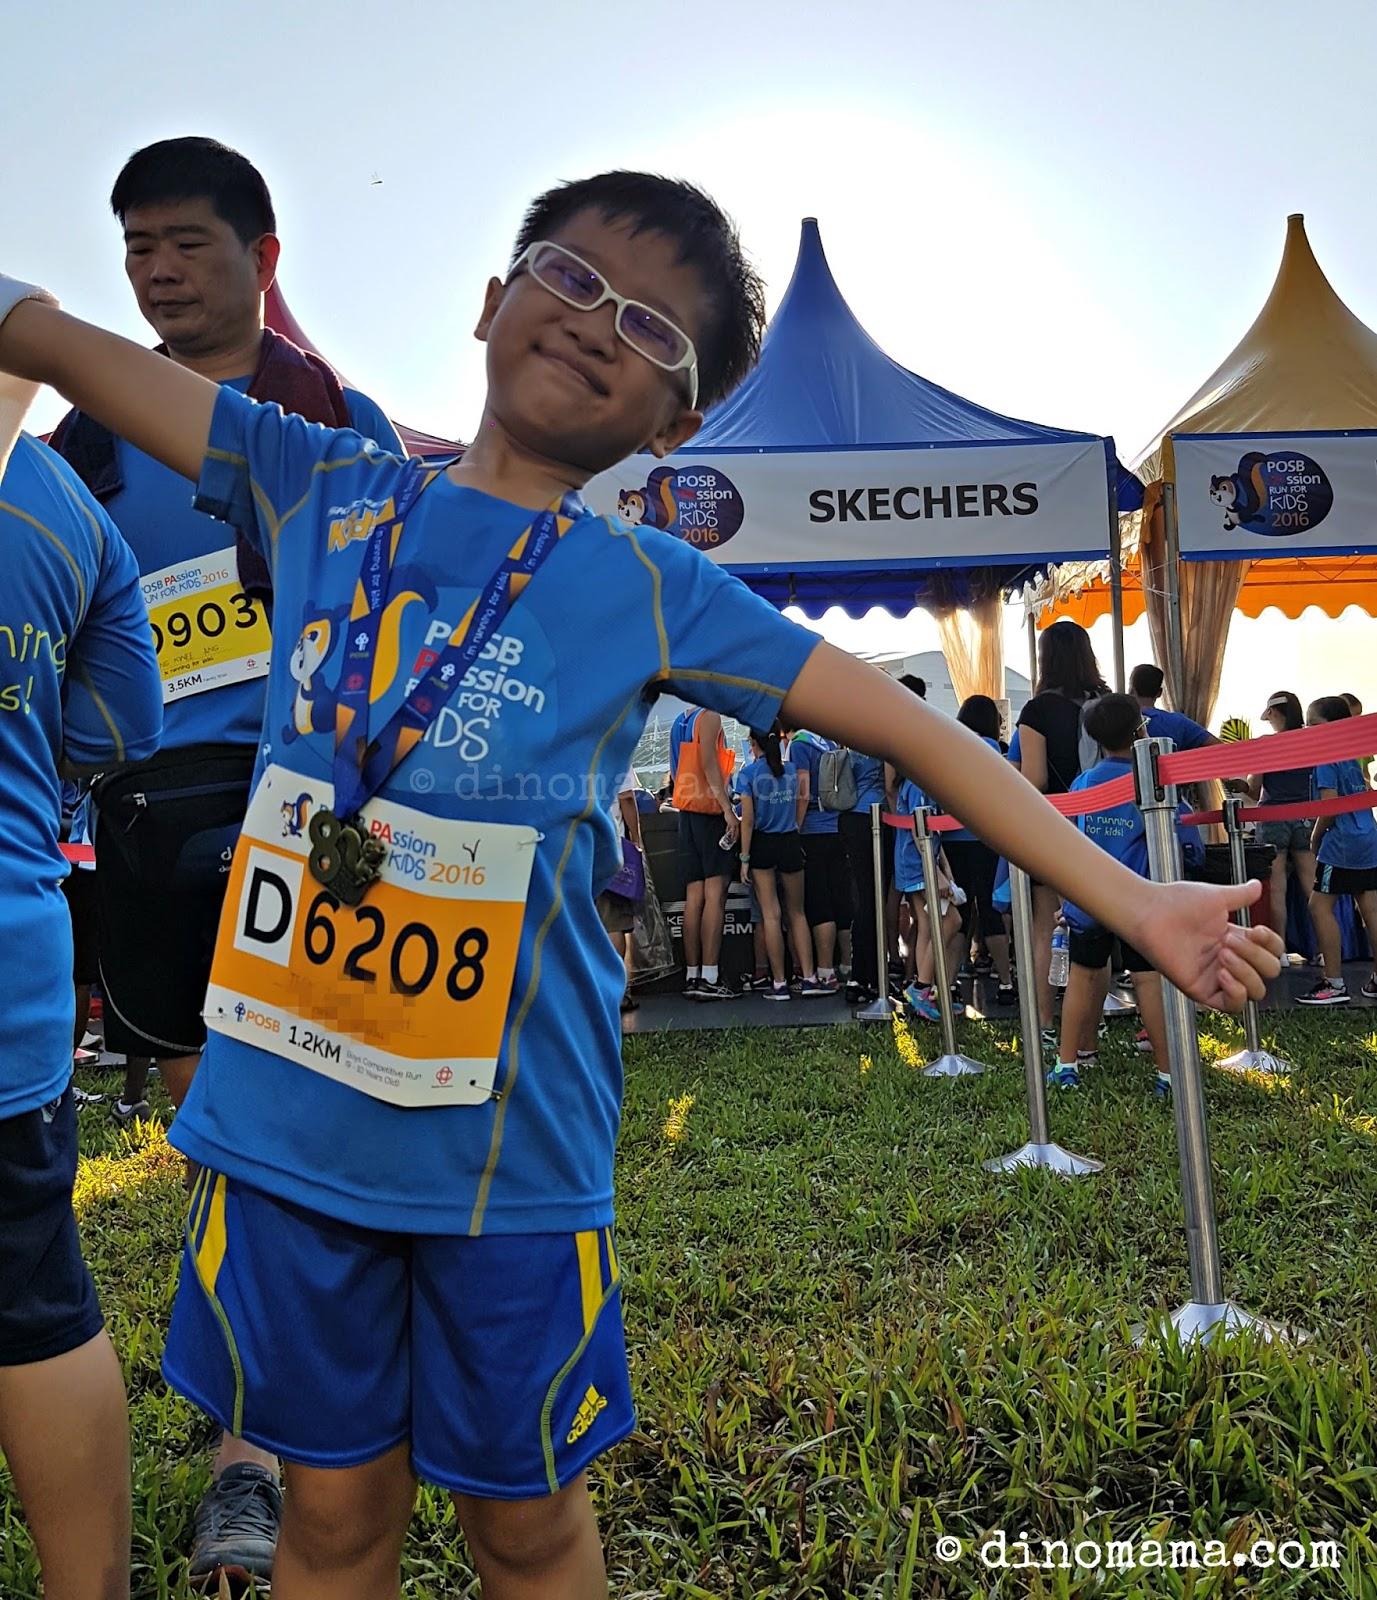 Posb Passion Run For Kids